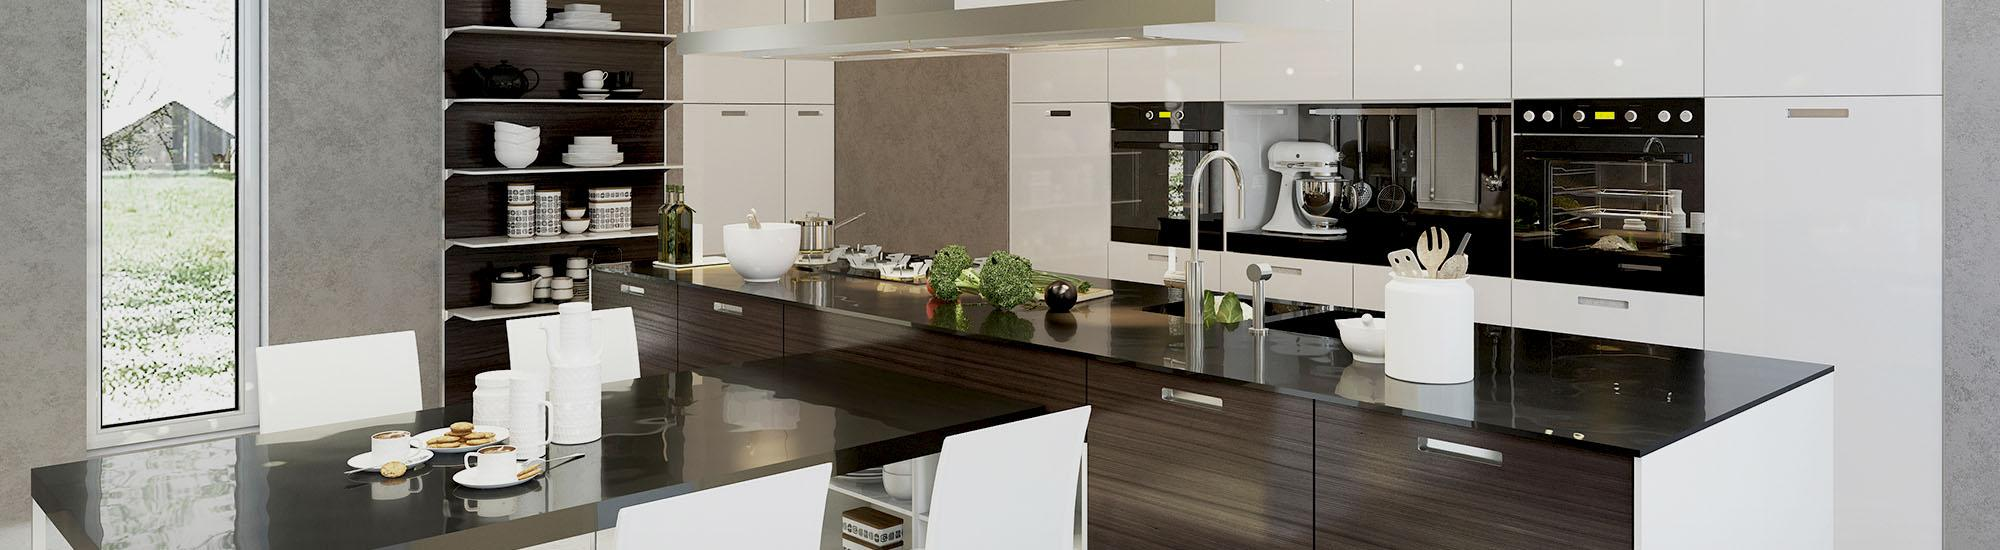 Kitchens toronto toronto kitchens woodpecker kitchen for Kitchen designs toronto